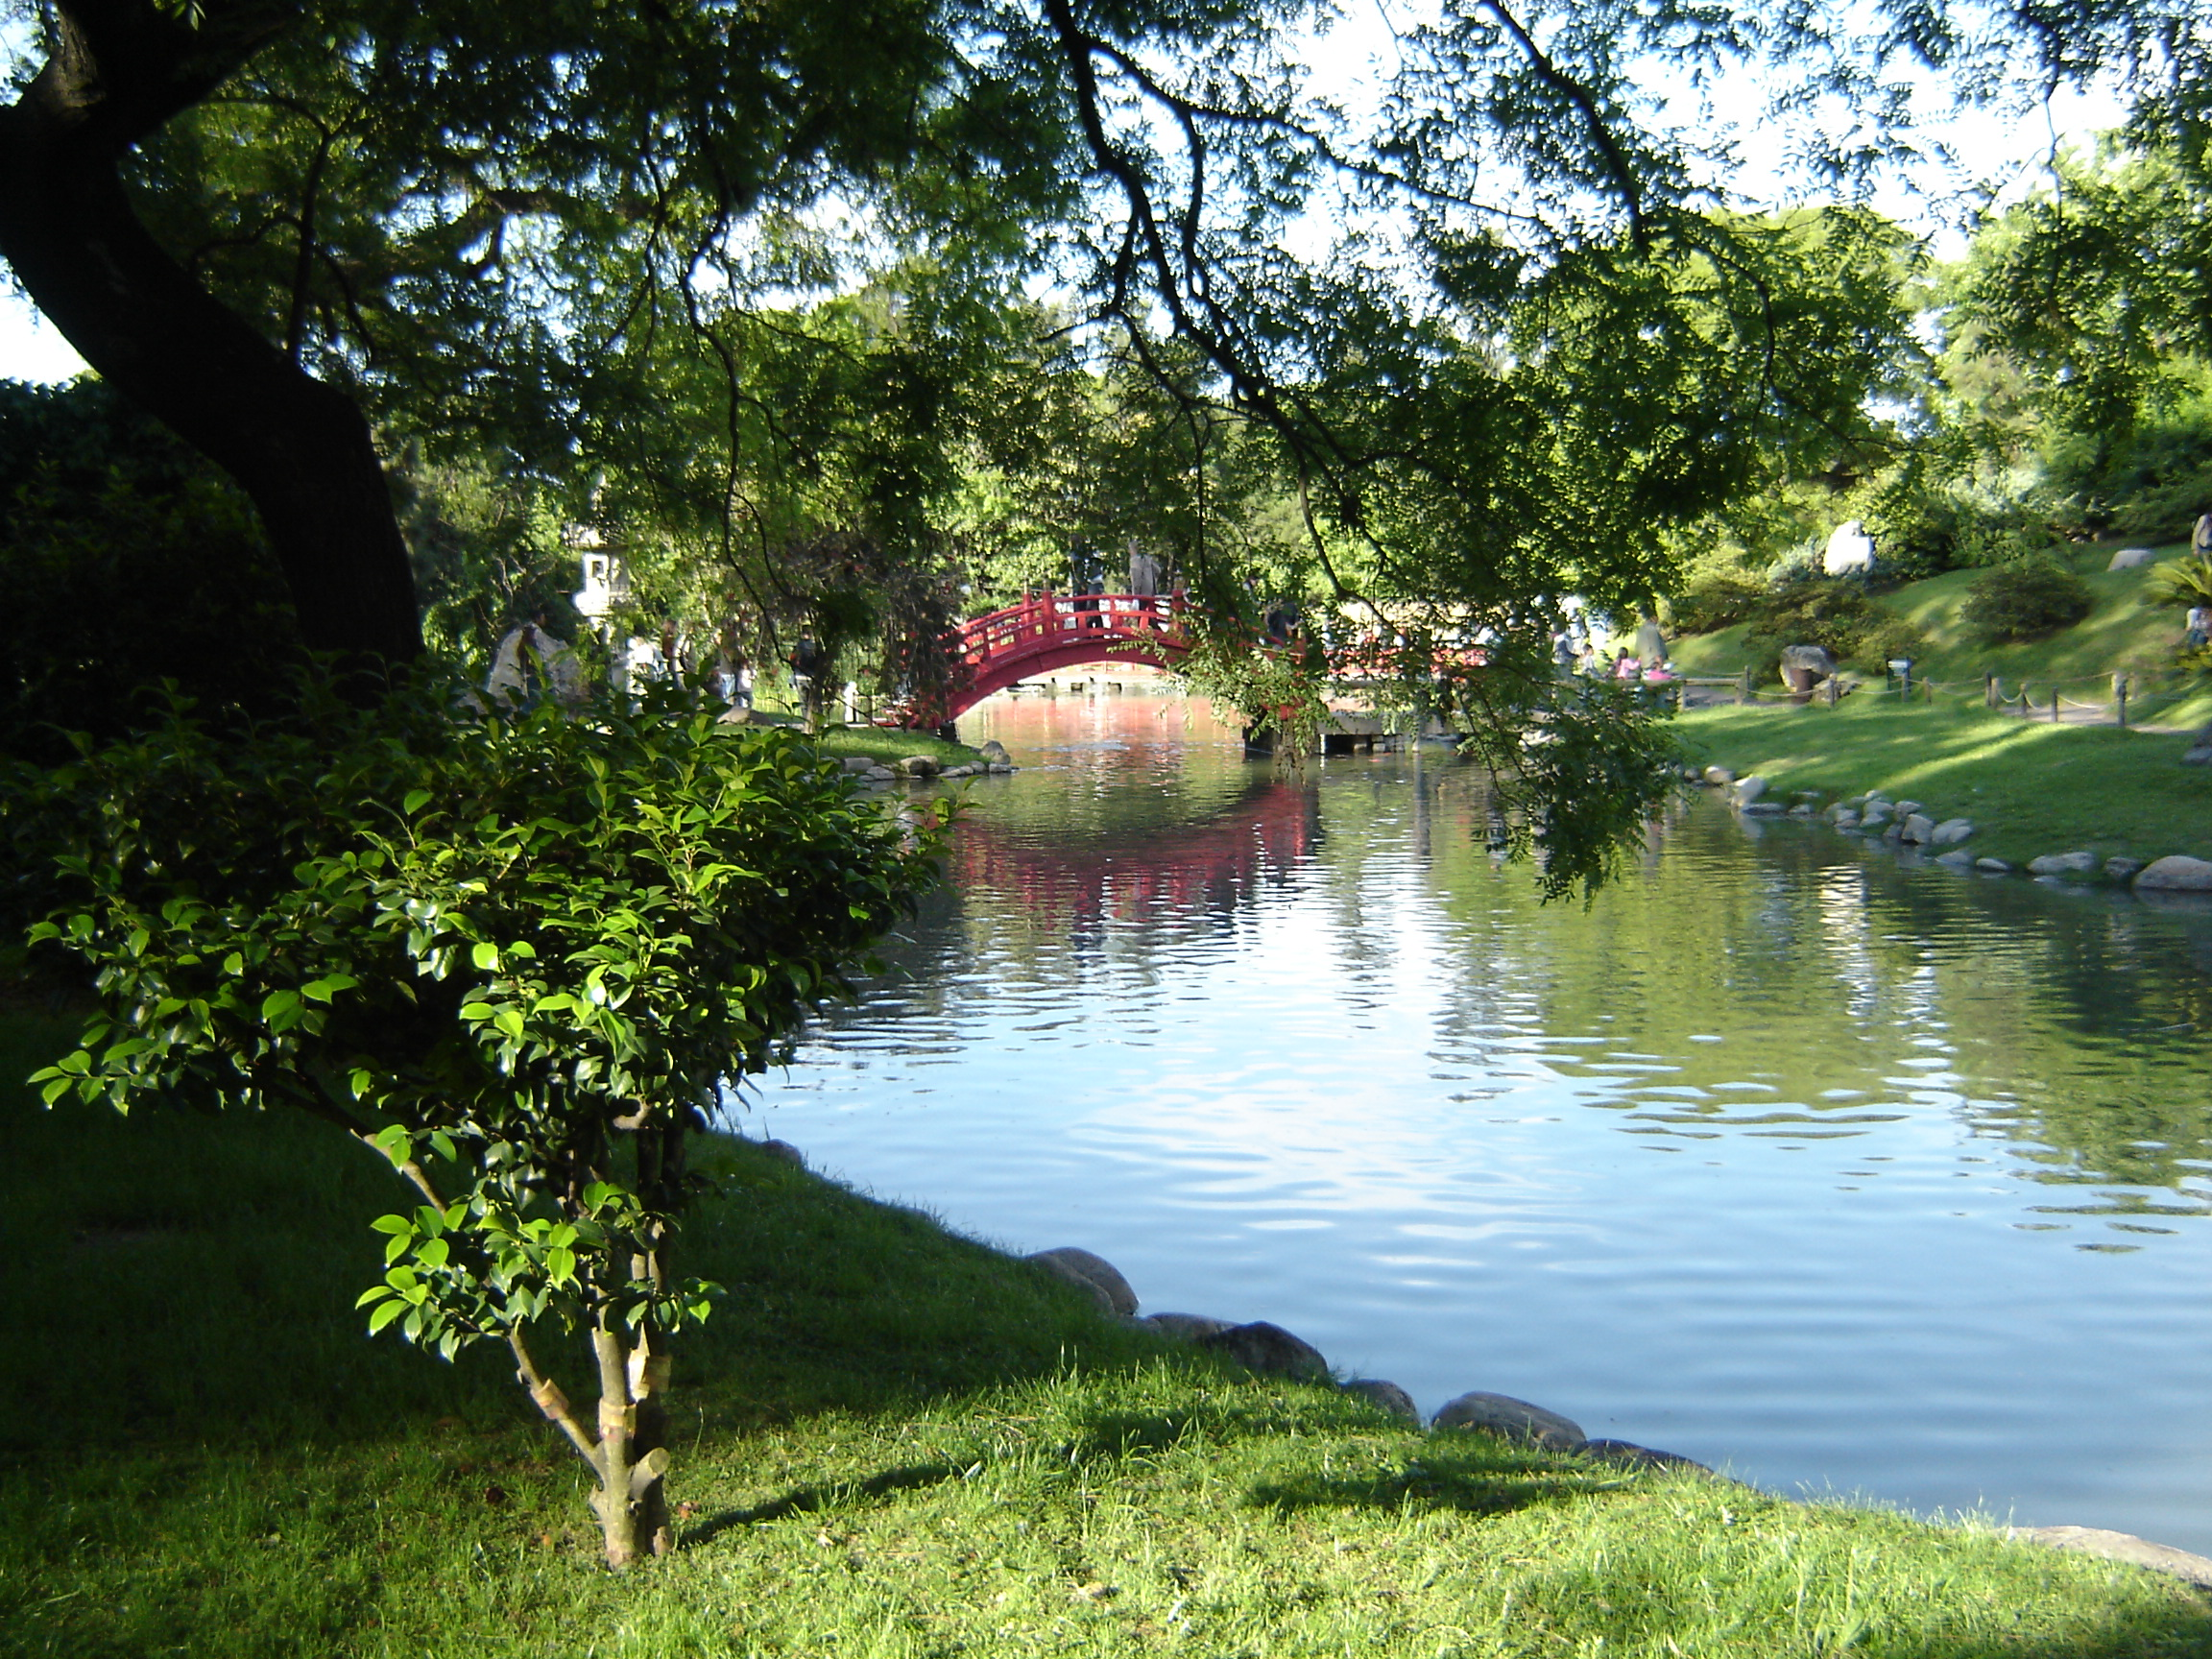 Fotos del jardines taringa - Fotografias de jardines ...